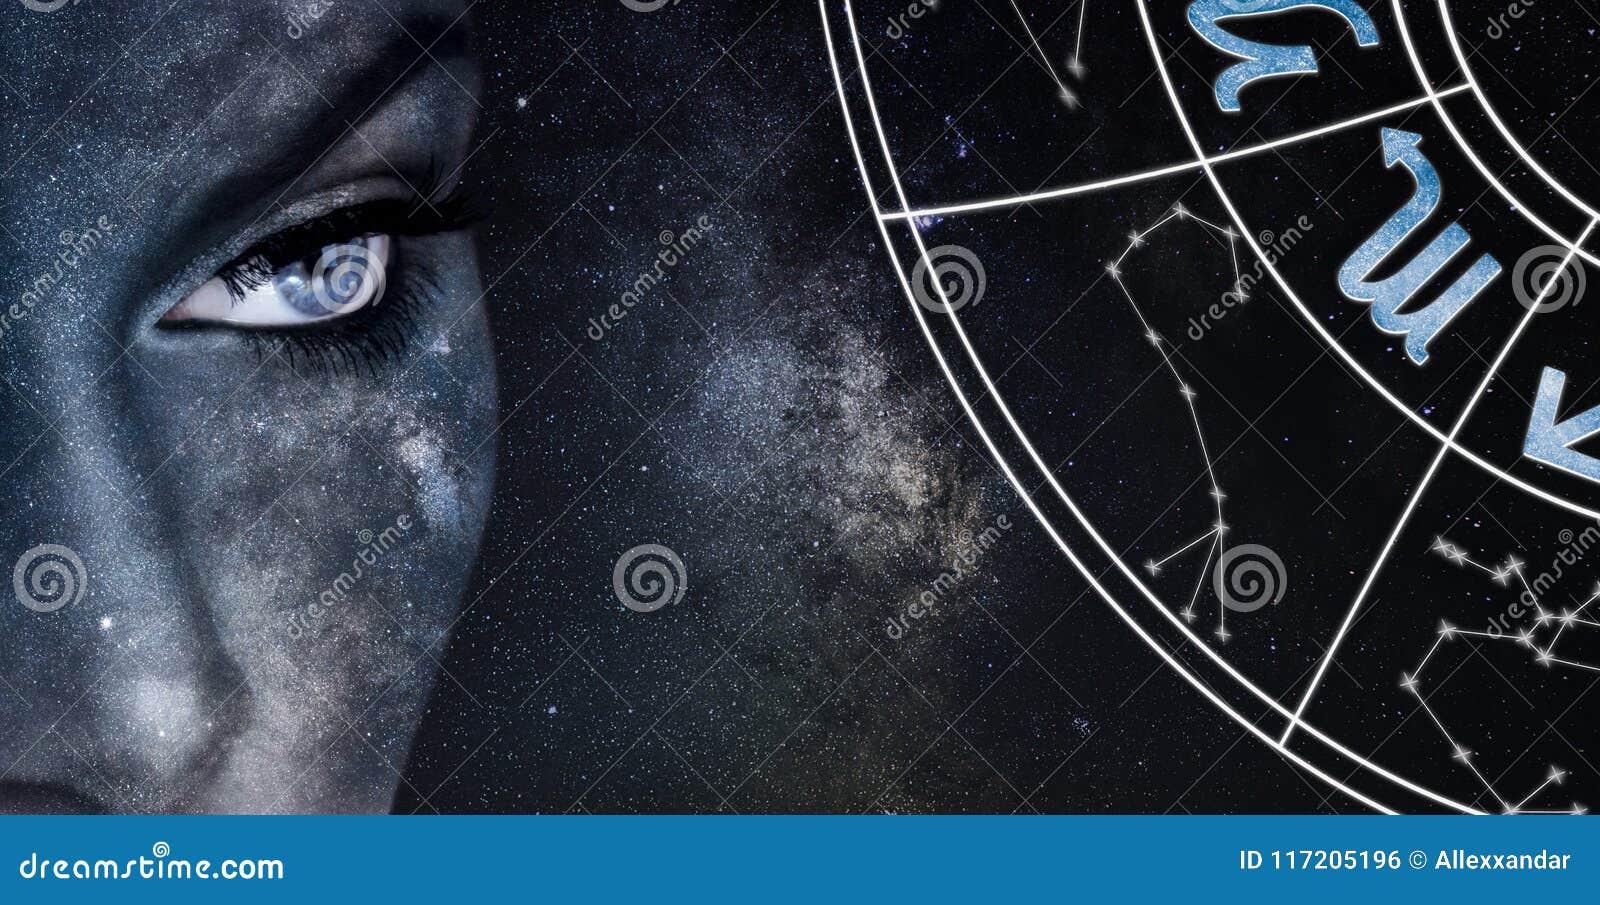 Scorpio Horoscope Sign. Astrology women night sky background